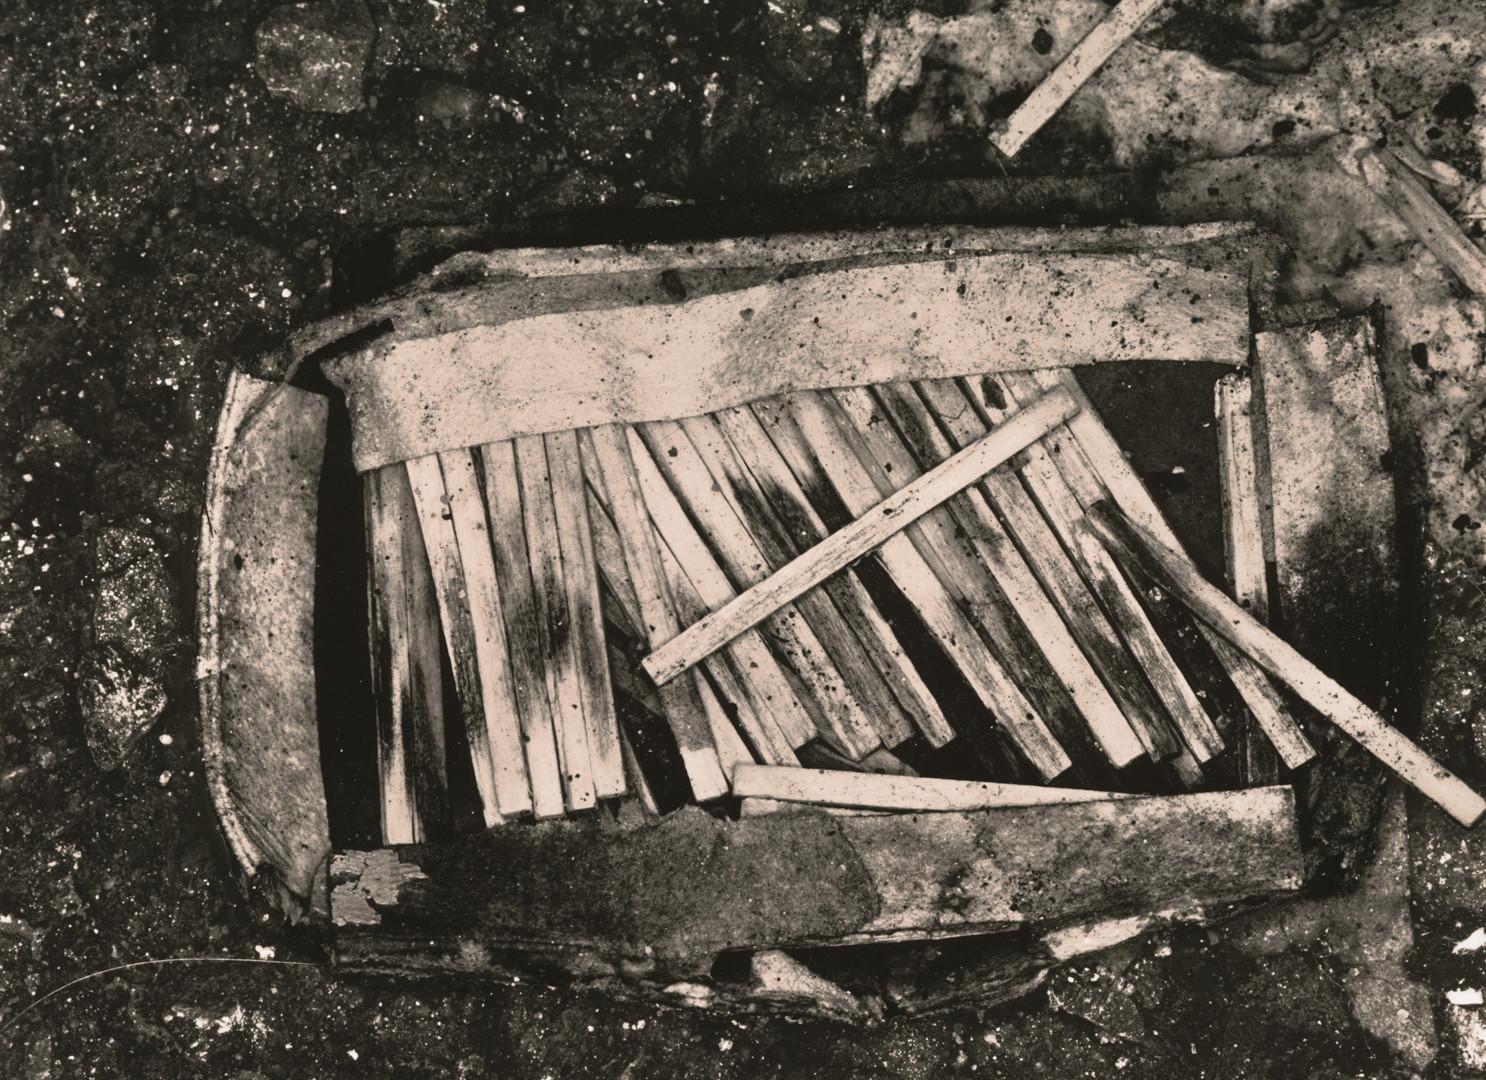 Irving Penn, Underfoot XXXI, New York, 2000